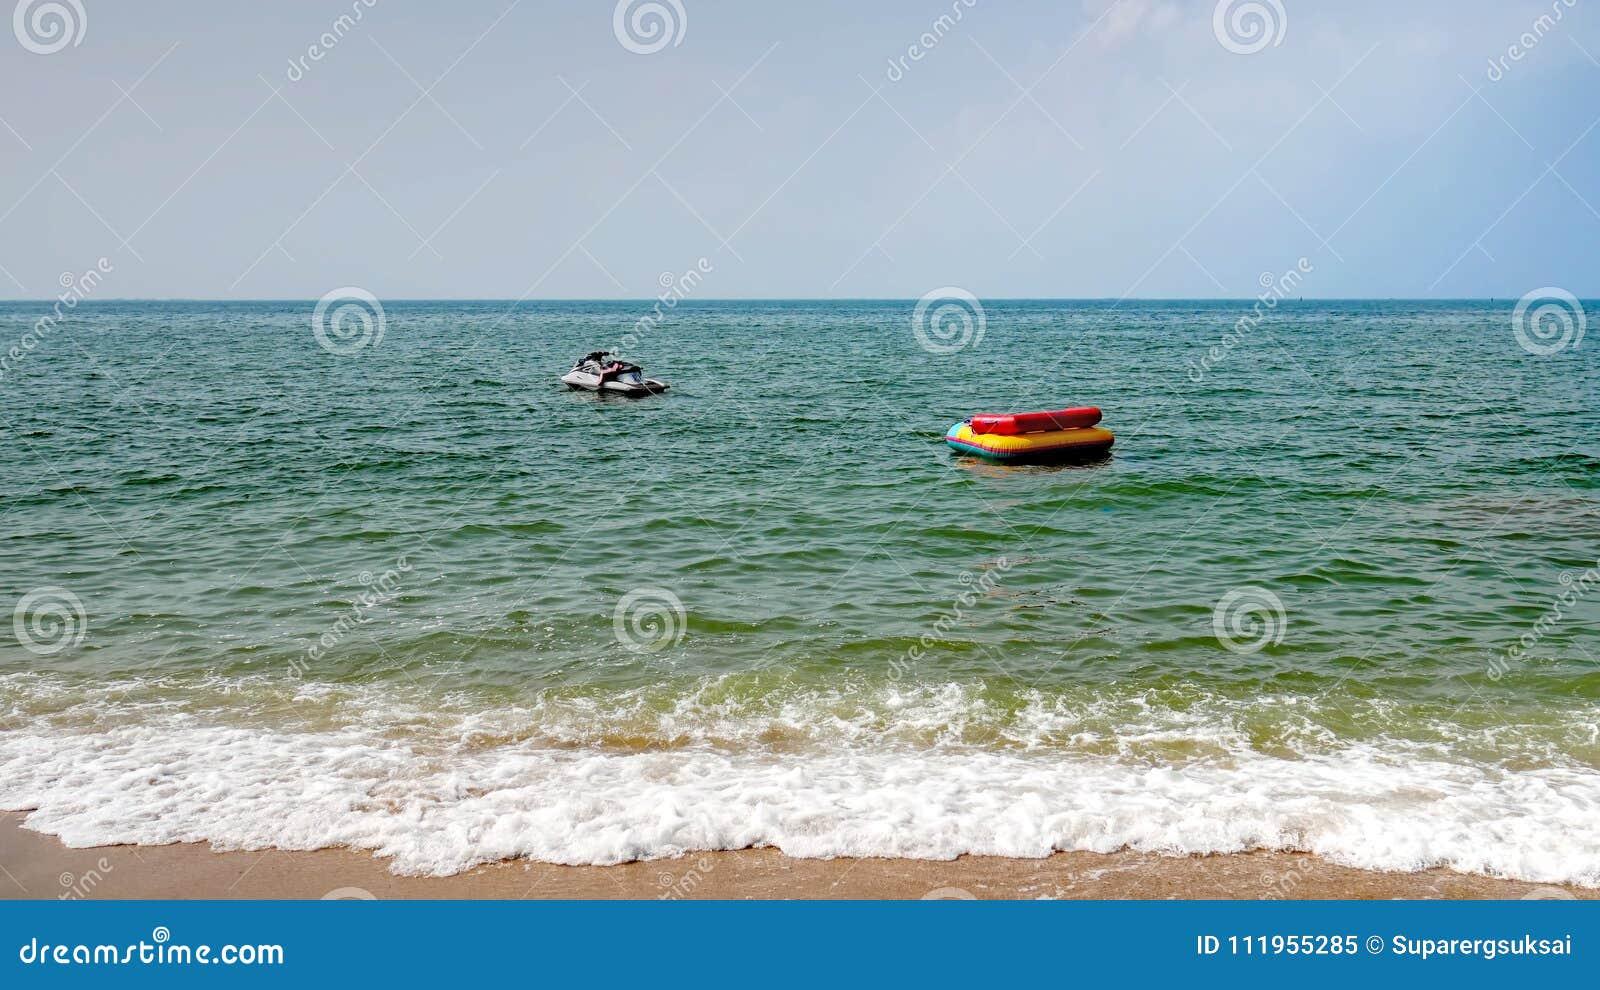 Witte Jet Ski Floating In The Sea